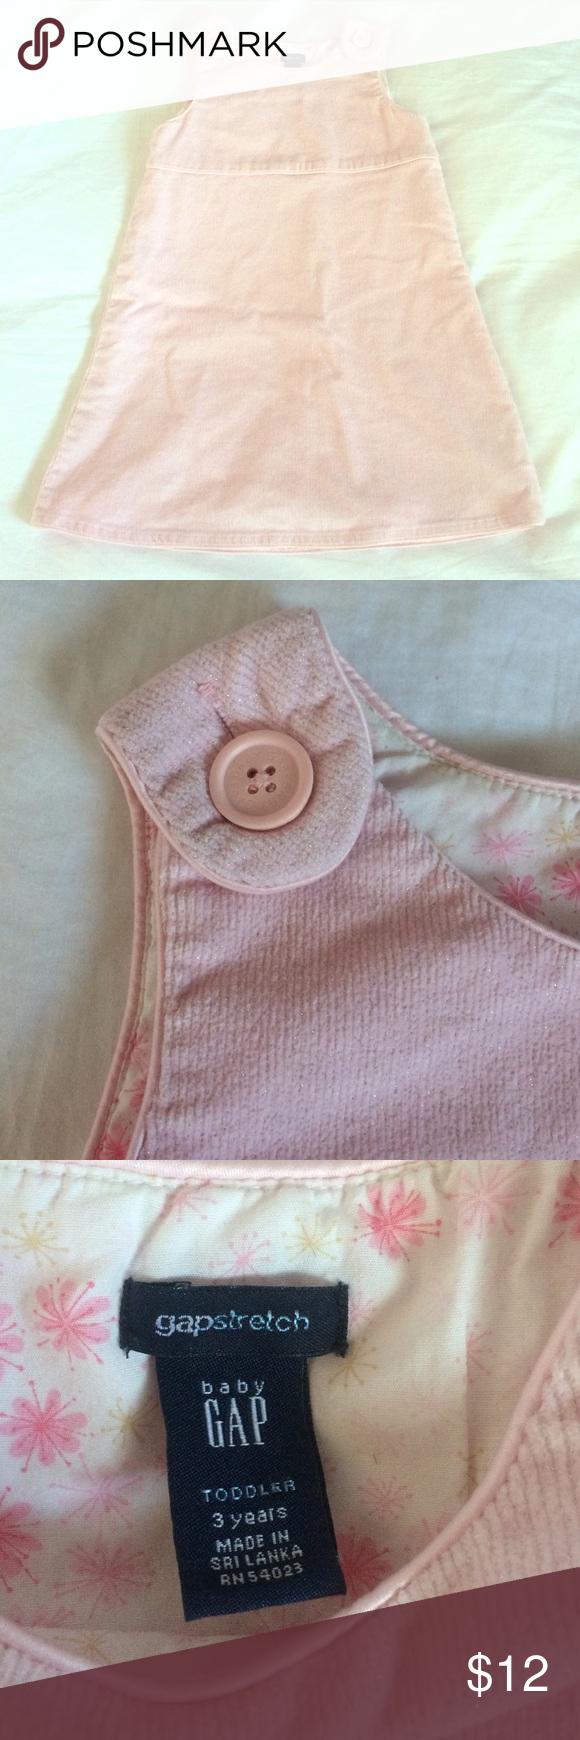 🎀NWOT Baby Gap Jumper Dress🎀 Super cute light pink, shimmery jumper dress from Baby Gap. NWOT! Size 3T. Smoke FREE home as always! 💕 GAP Dresses Casual